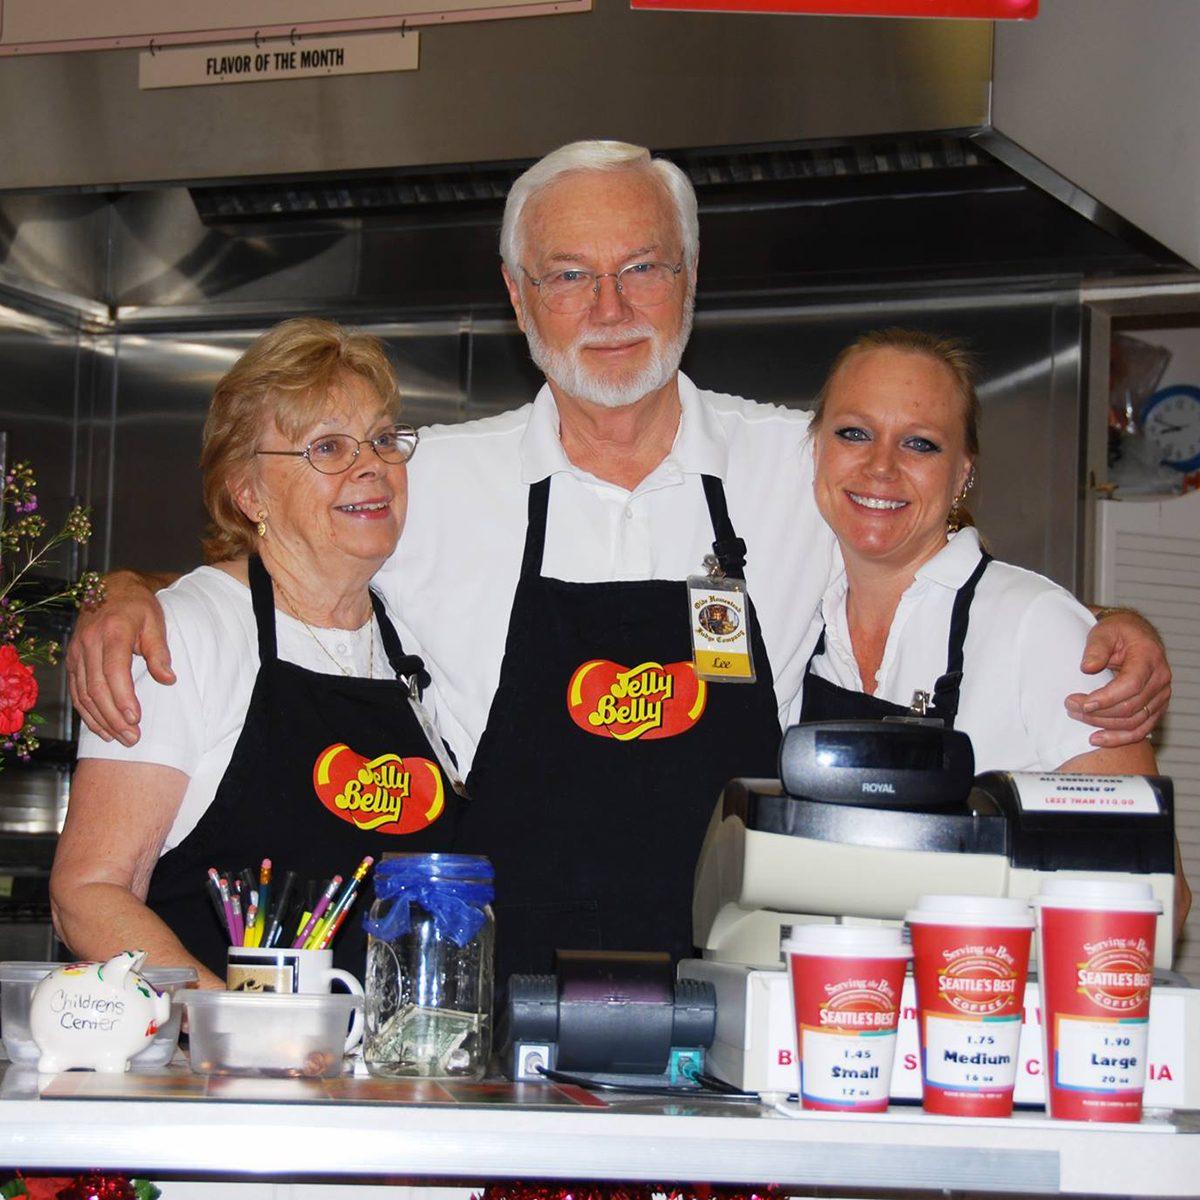 The Best Fudge Shop in California - The Bighorn Fudge Company